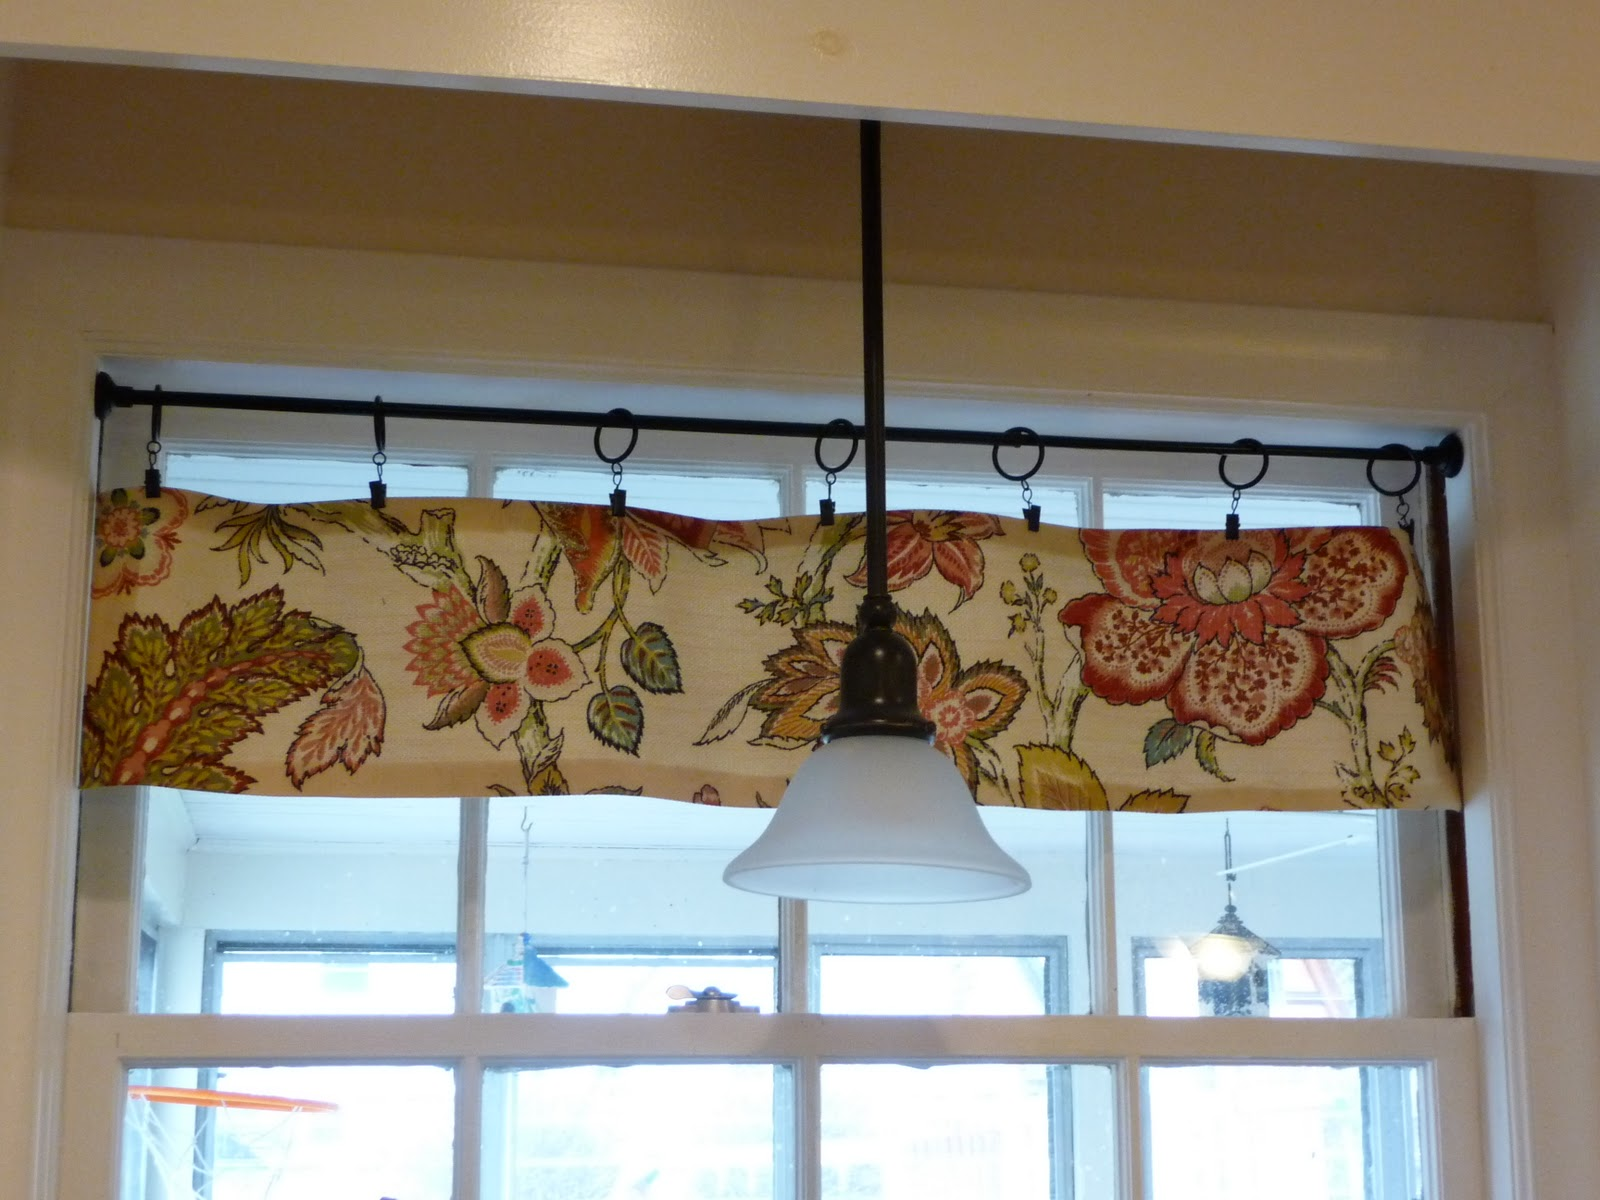 pics new bathroom com shower rod curtain valance ikea curtains malaysia of designs elderbranch